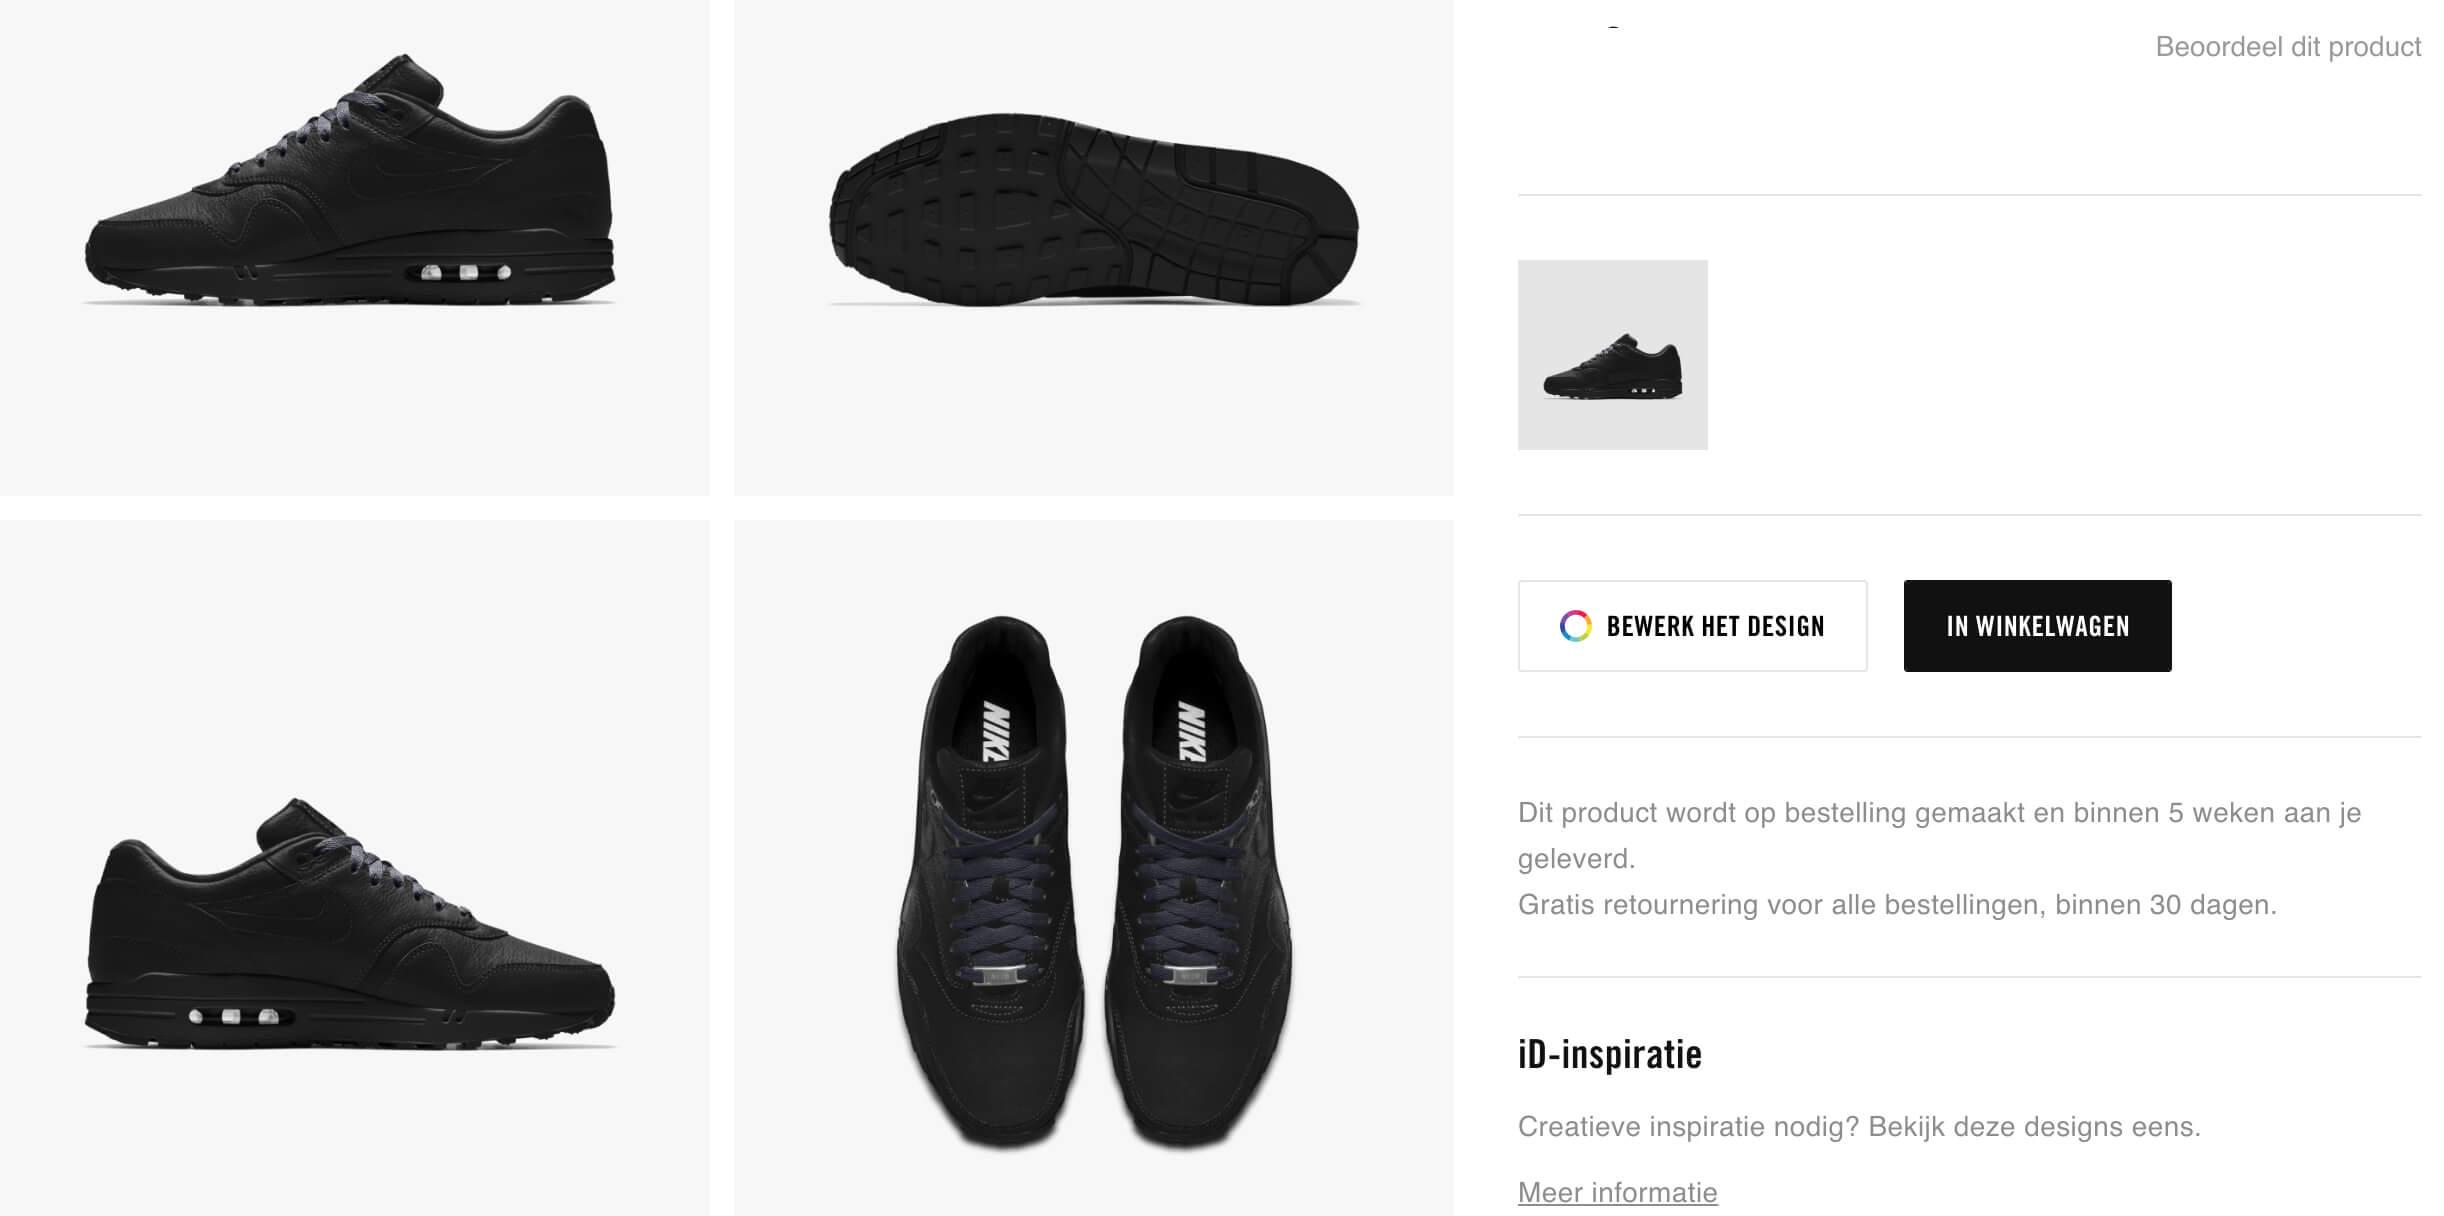 Ontwerp je eigen Nike, Adidas of Reebok sneakers Bekijk de